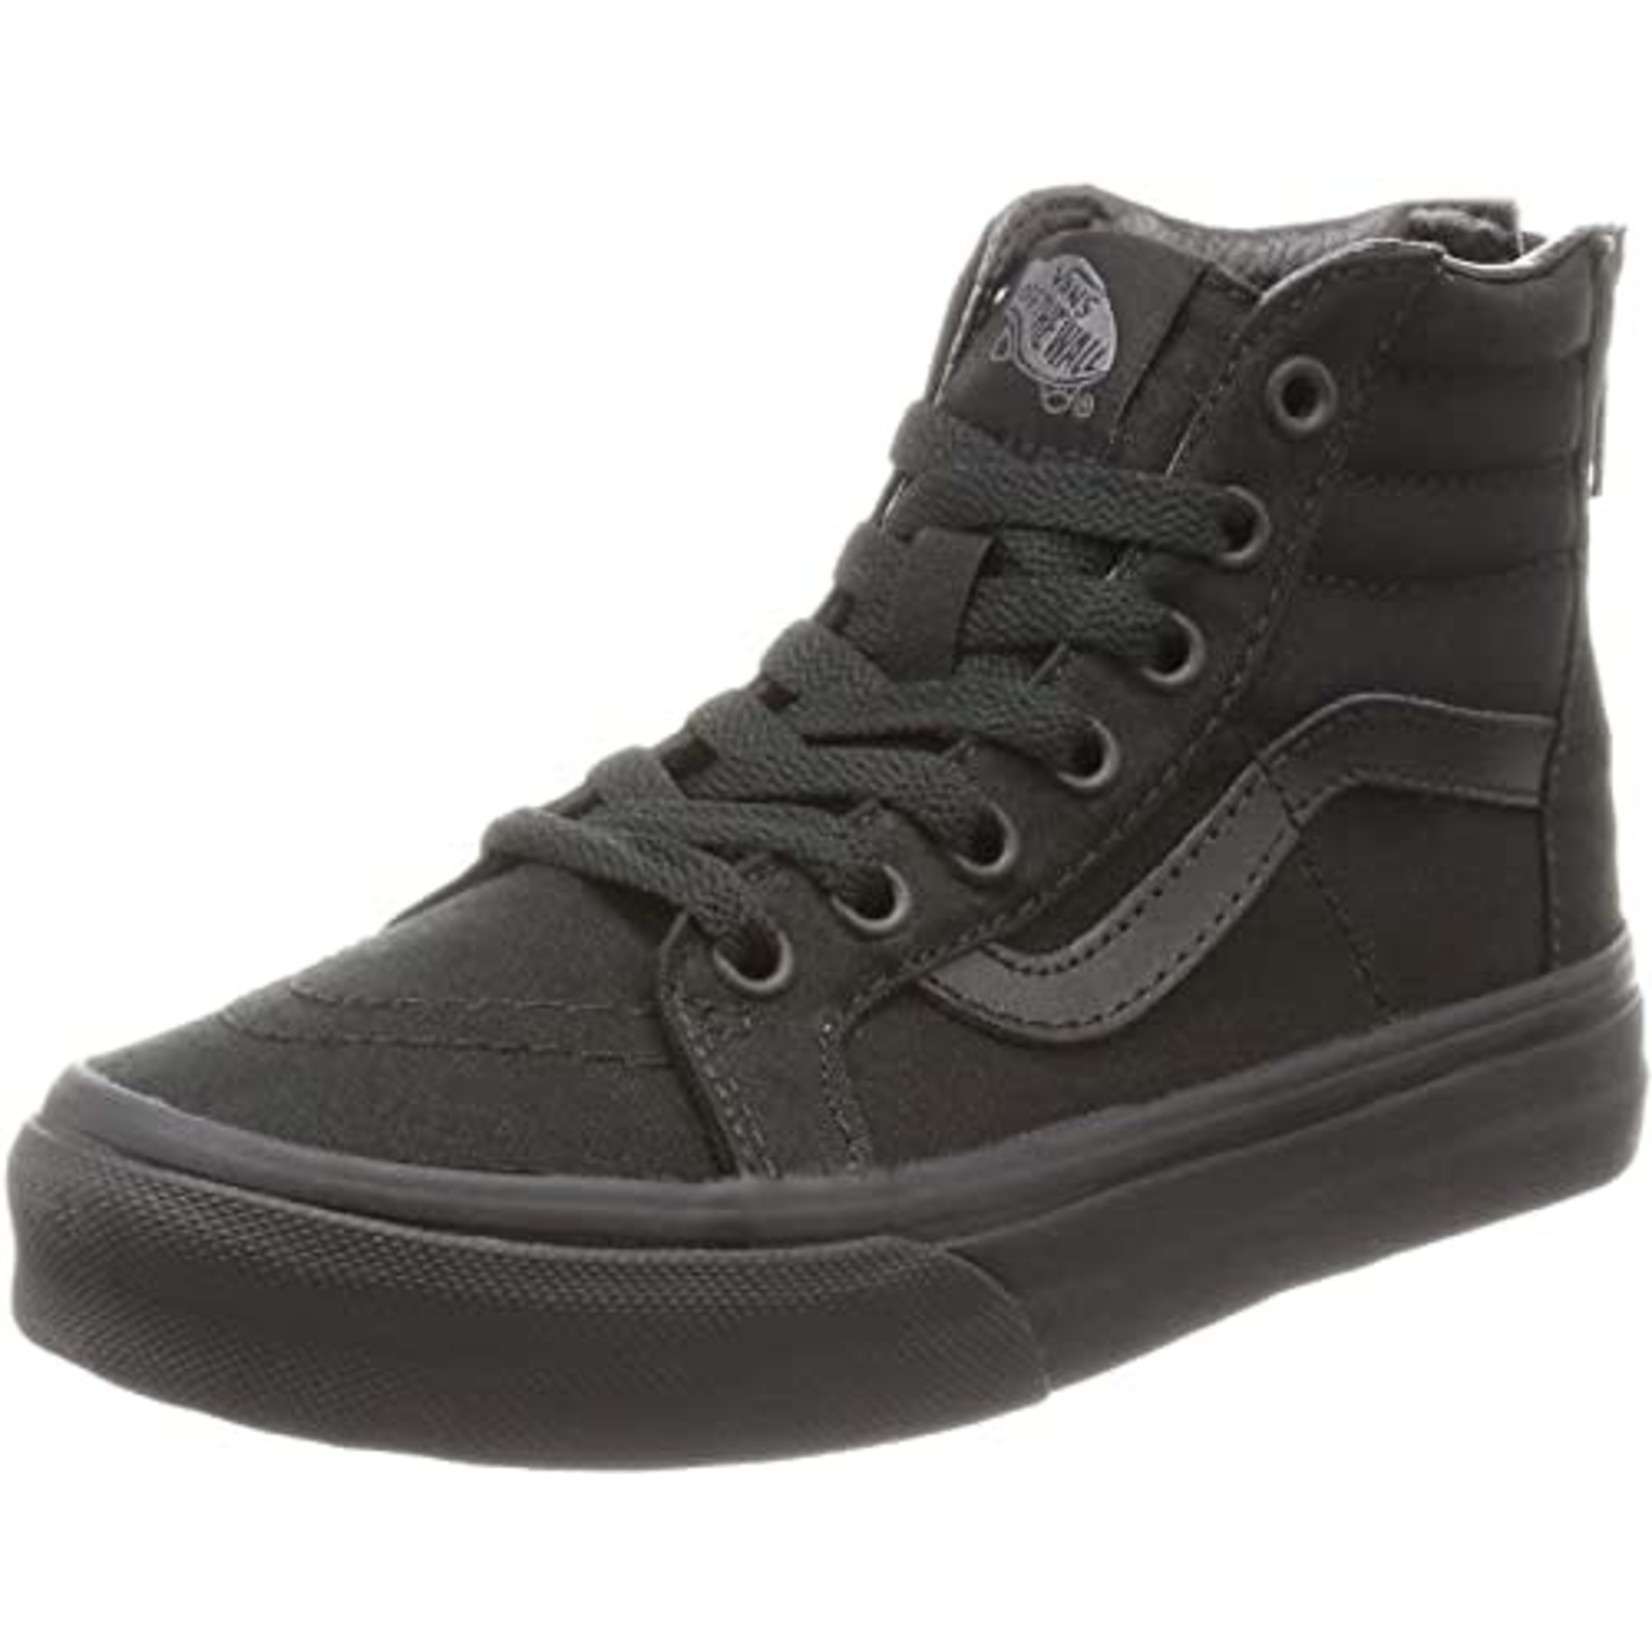 Vans Vans Casual Shoes, Filmore HI Zip, Boys